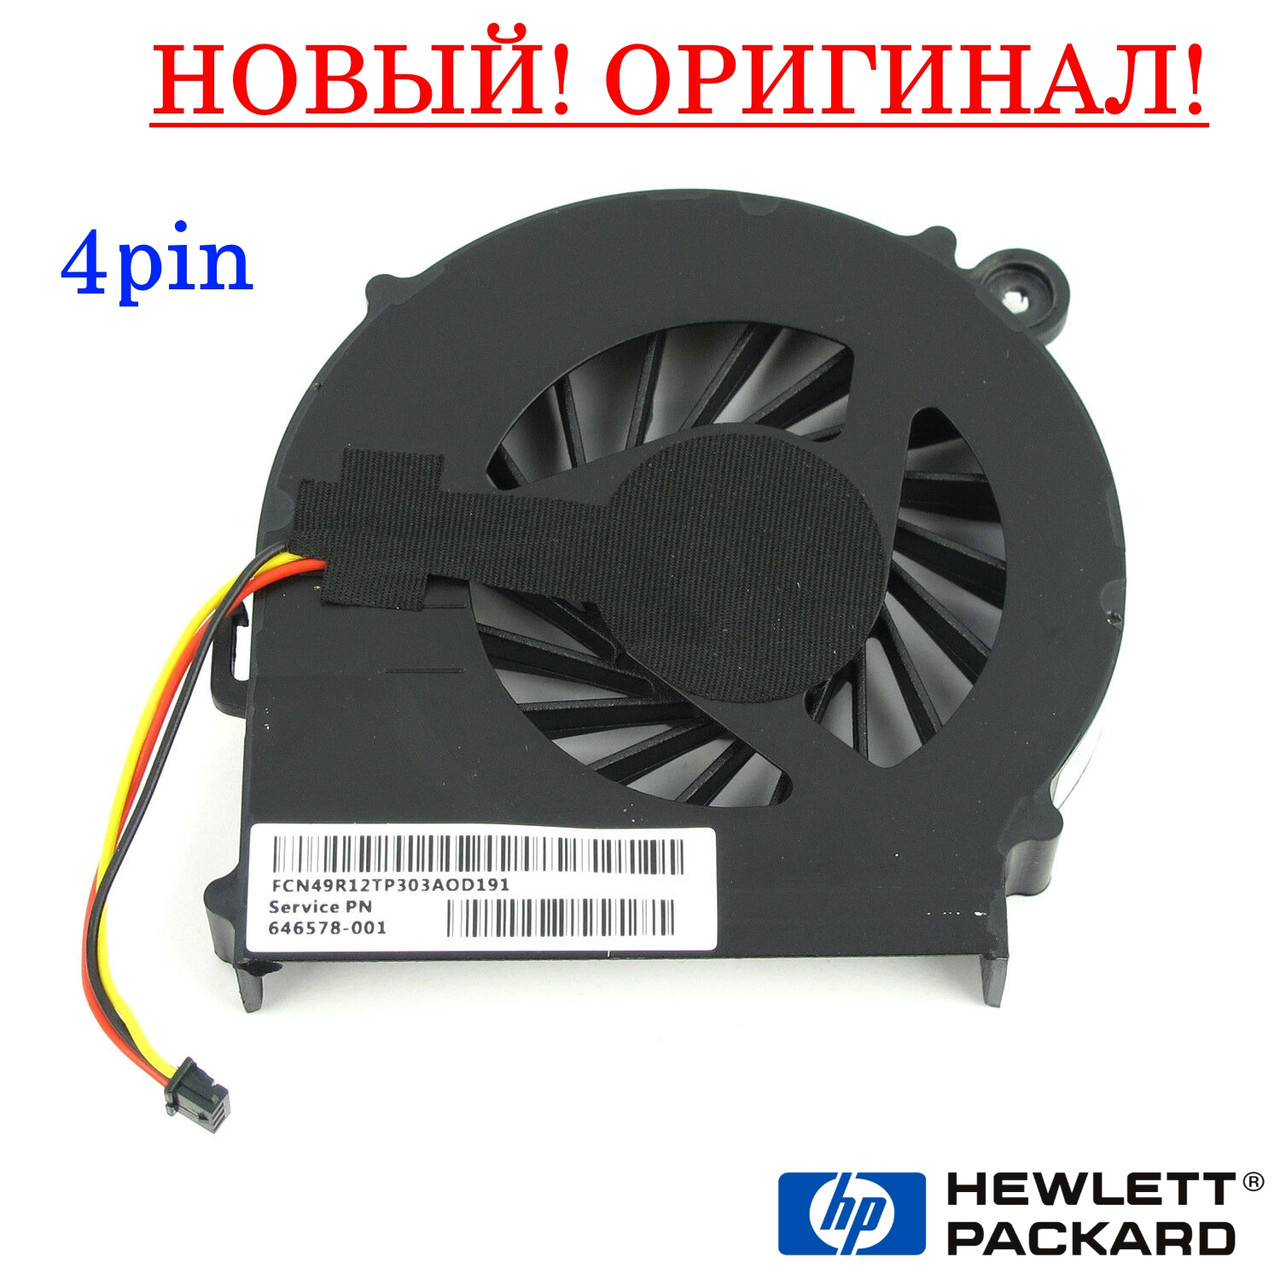 Оригинальный вентилятор кулер FAN для ноутбука HP G6, G6-1000 series (4pin) - 646578-001, KSB0805HA